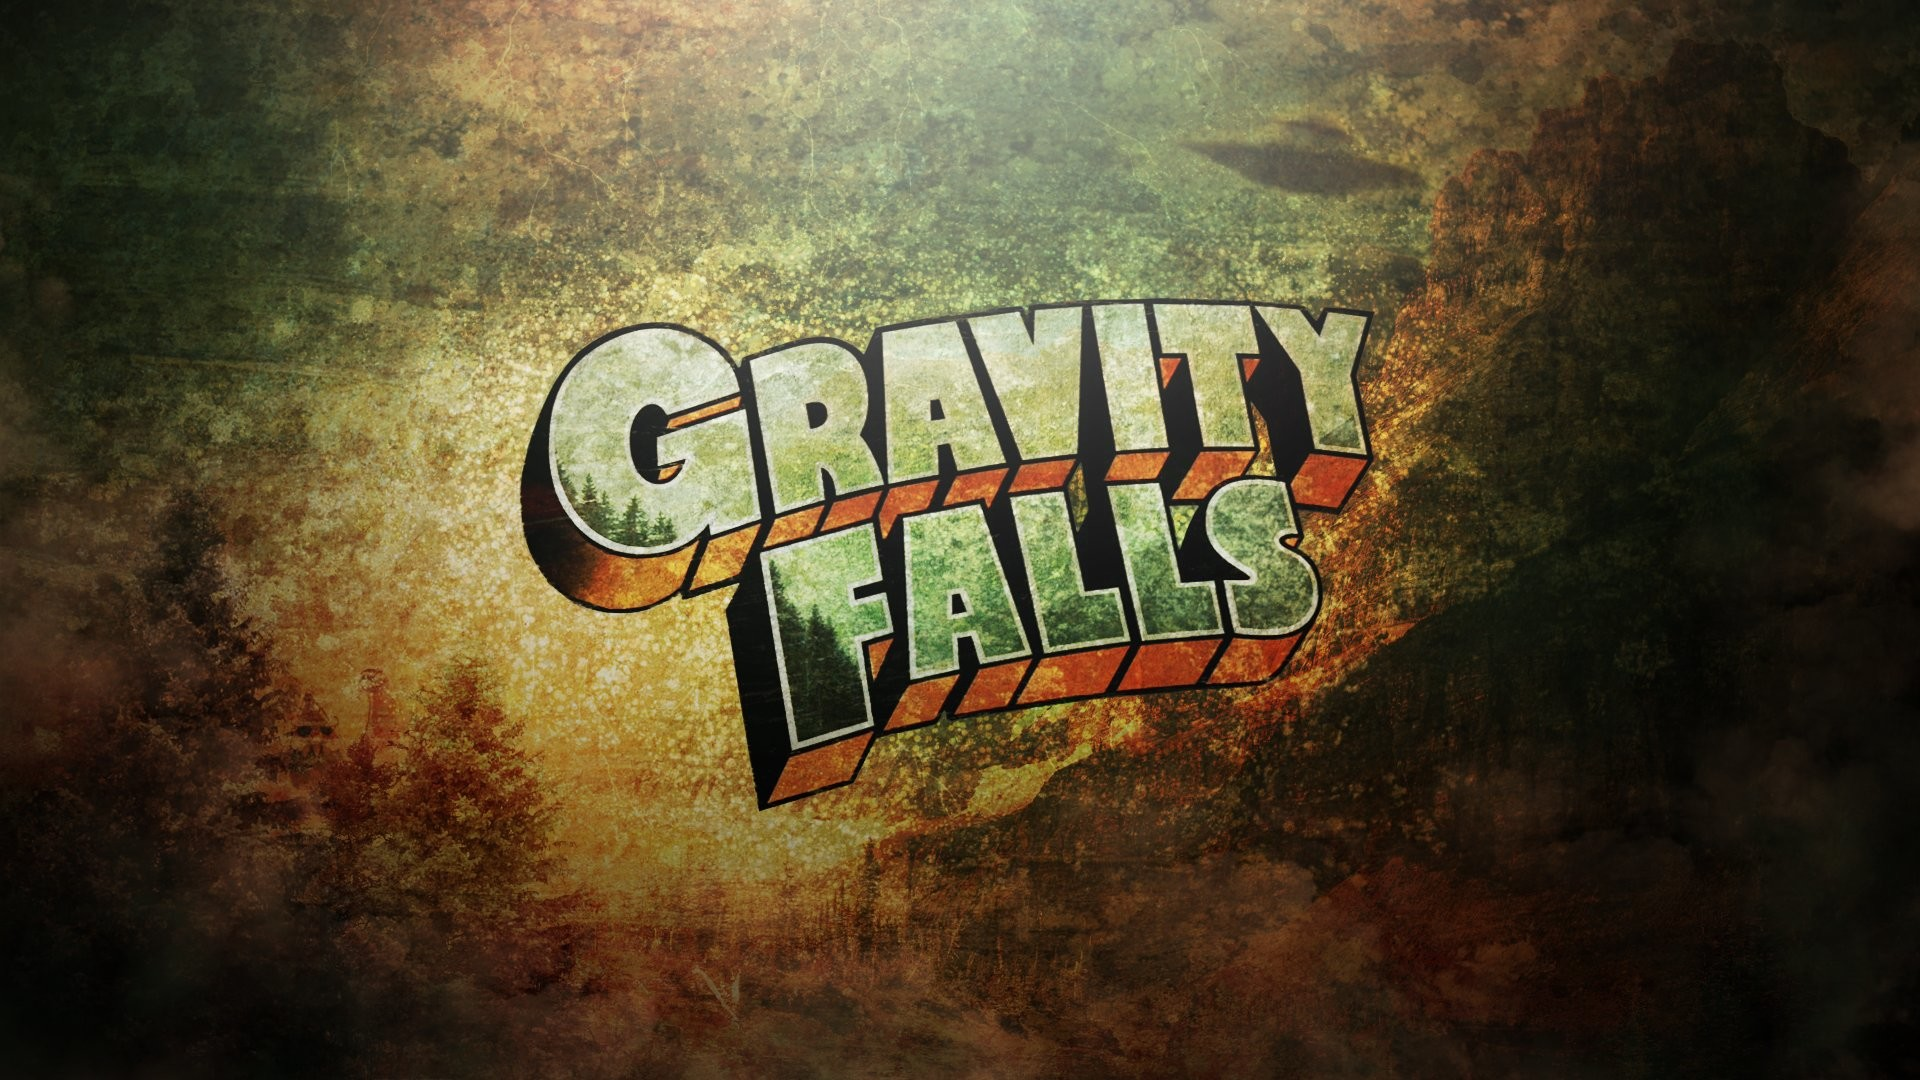 GRAVITY FALLS disney family animated cartoon series comedy wallpaper      459509   WallpaperUP